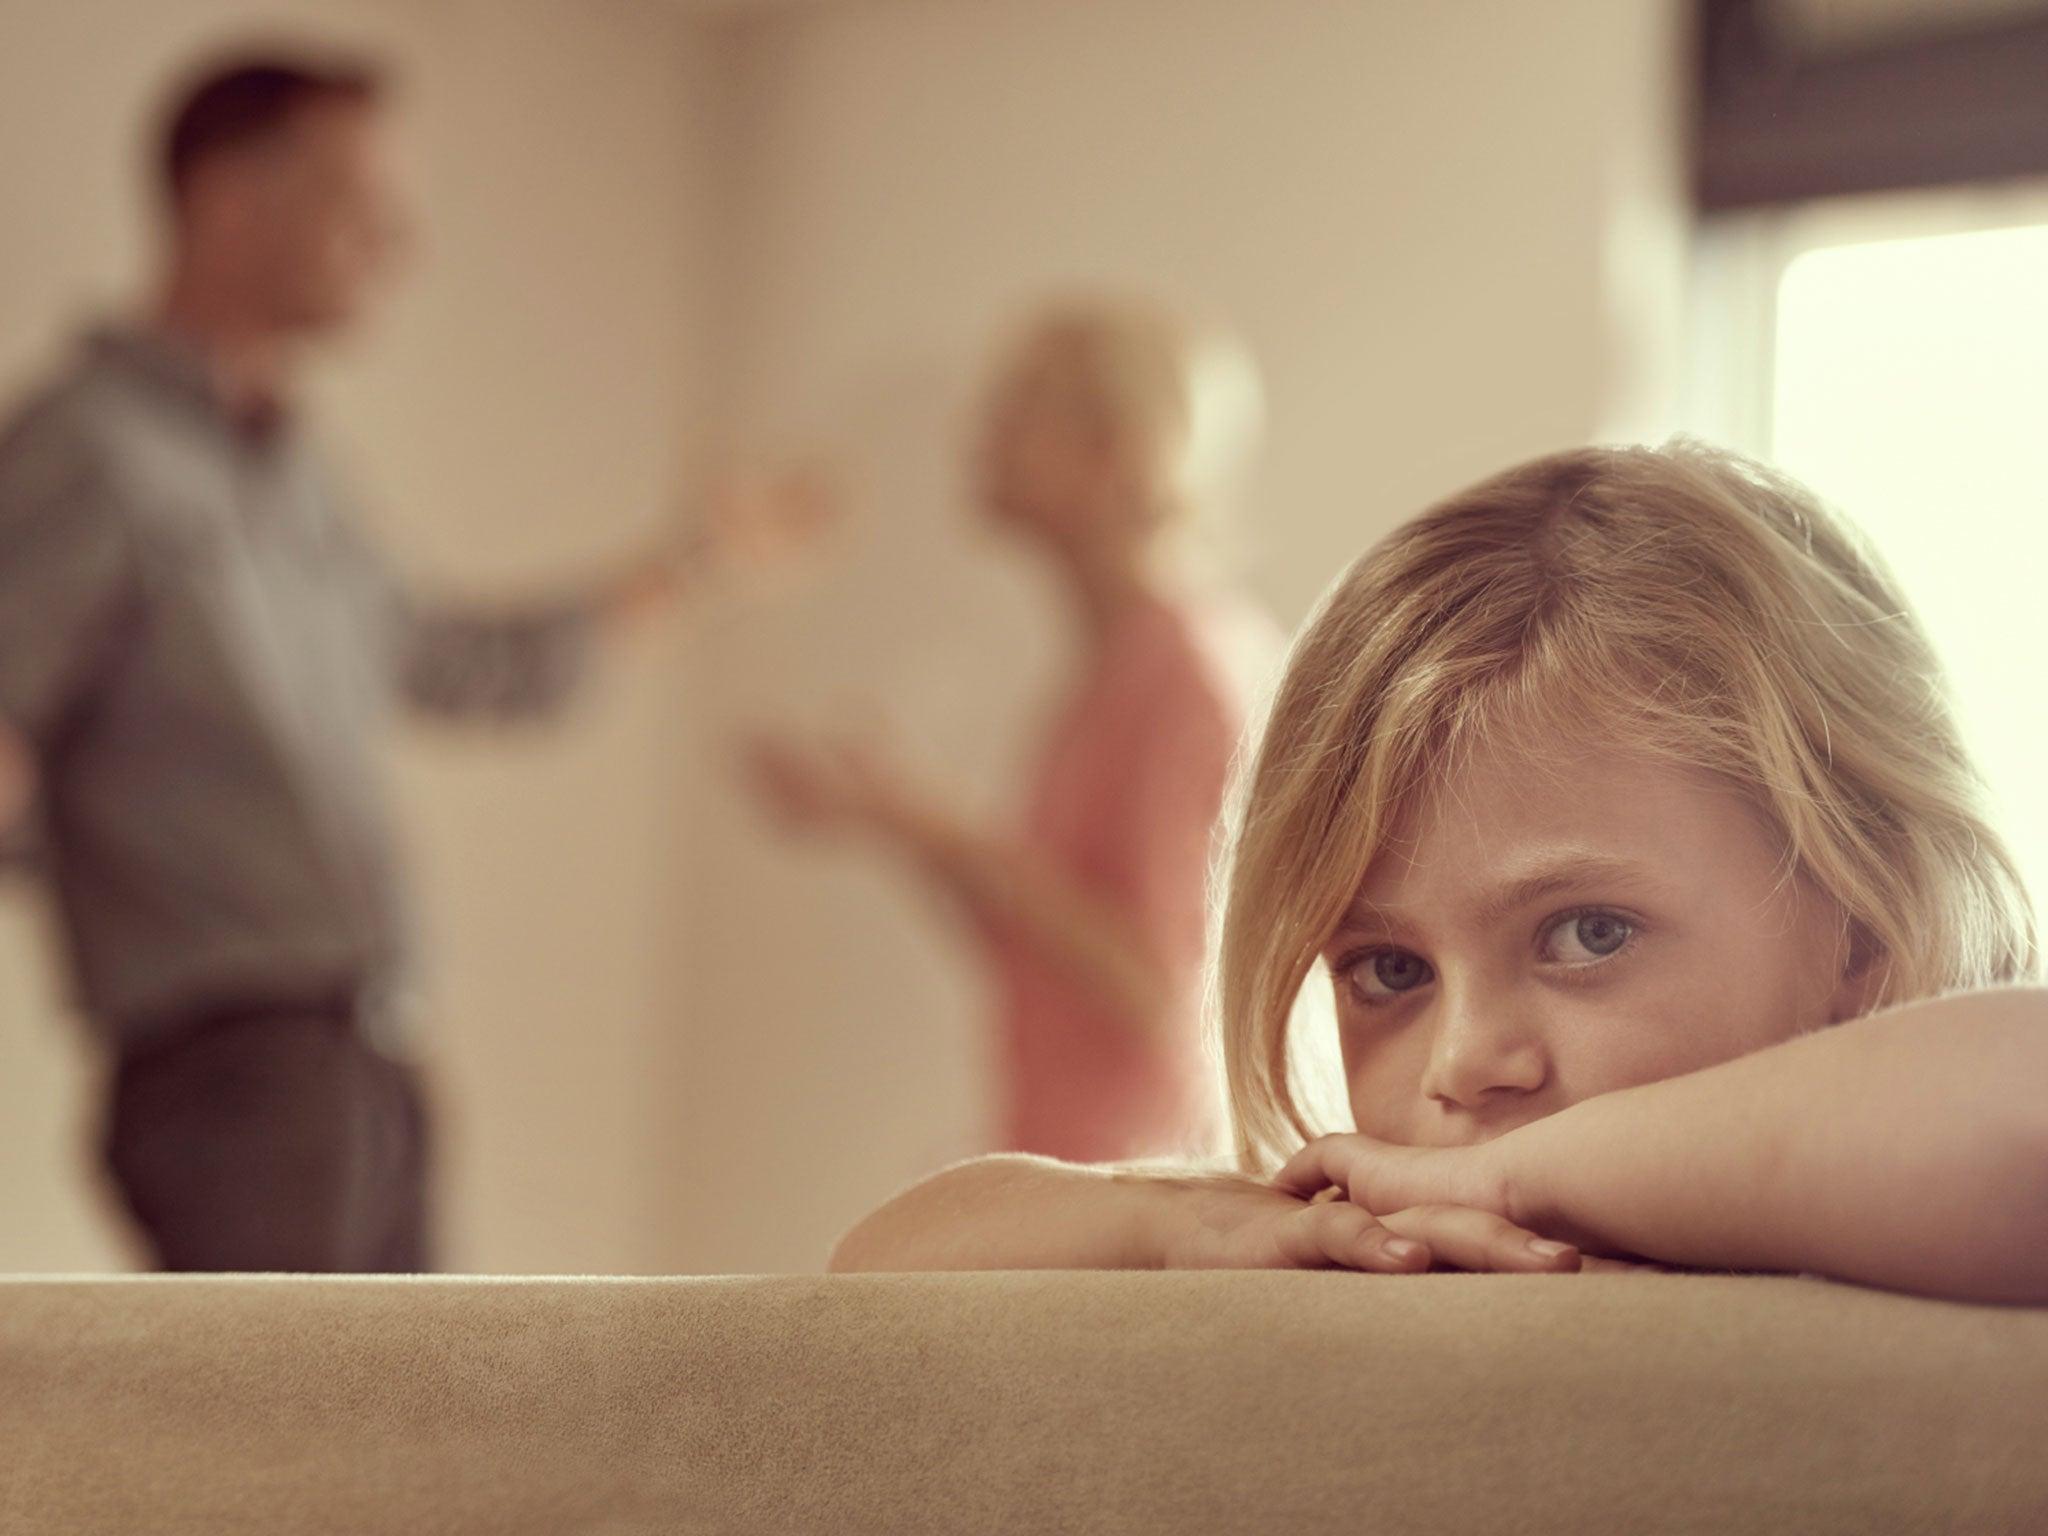 Nervous parents - children suffer